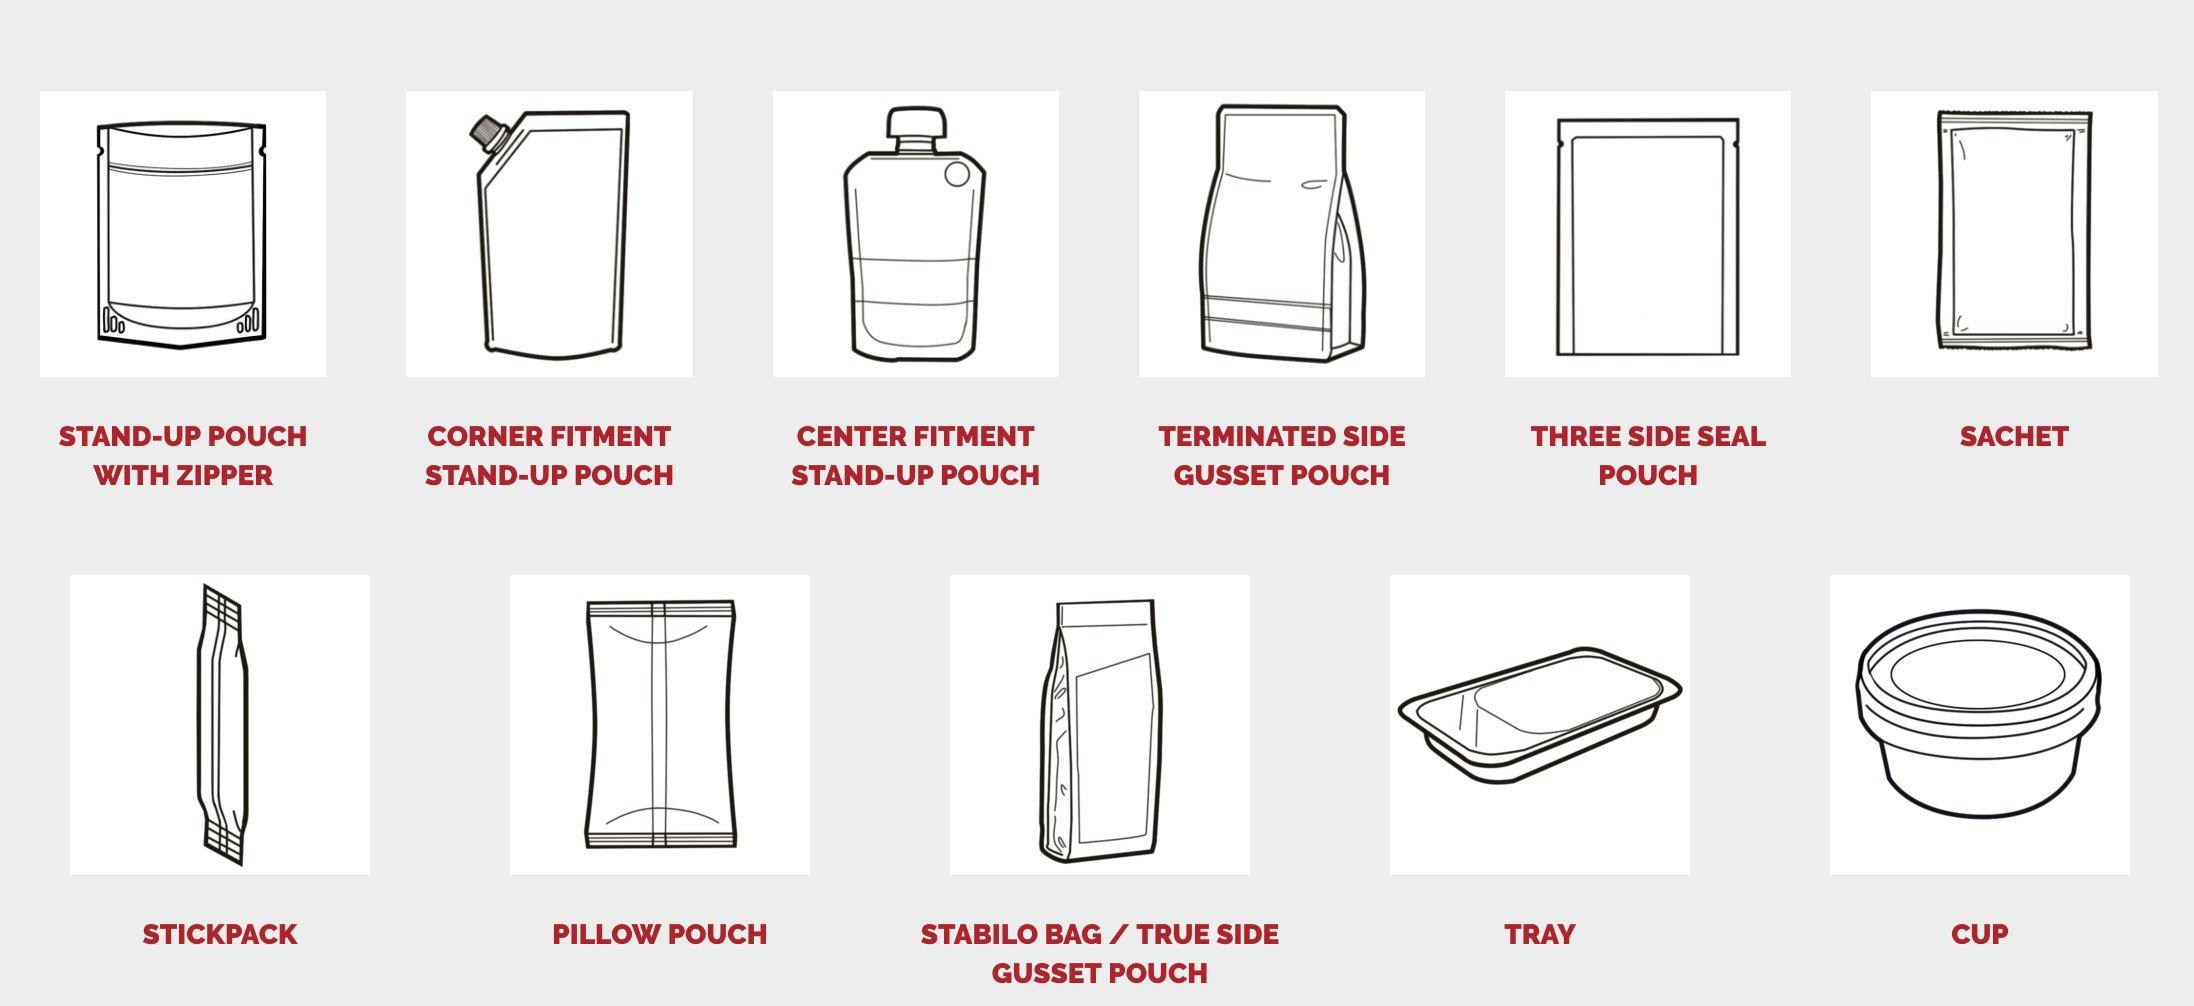 kflex packaging pouch options